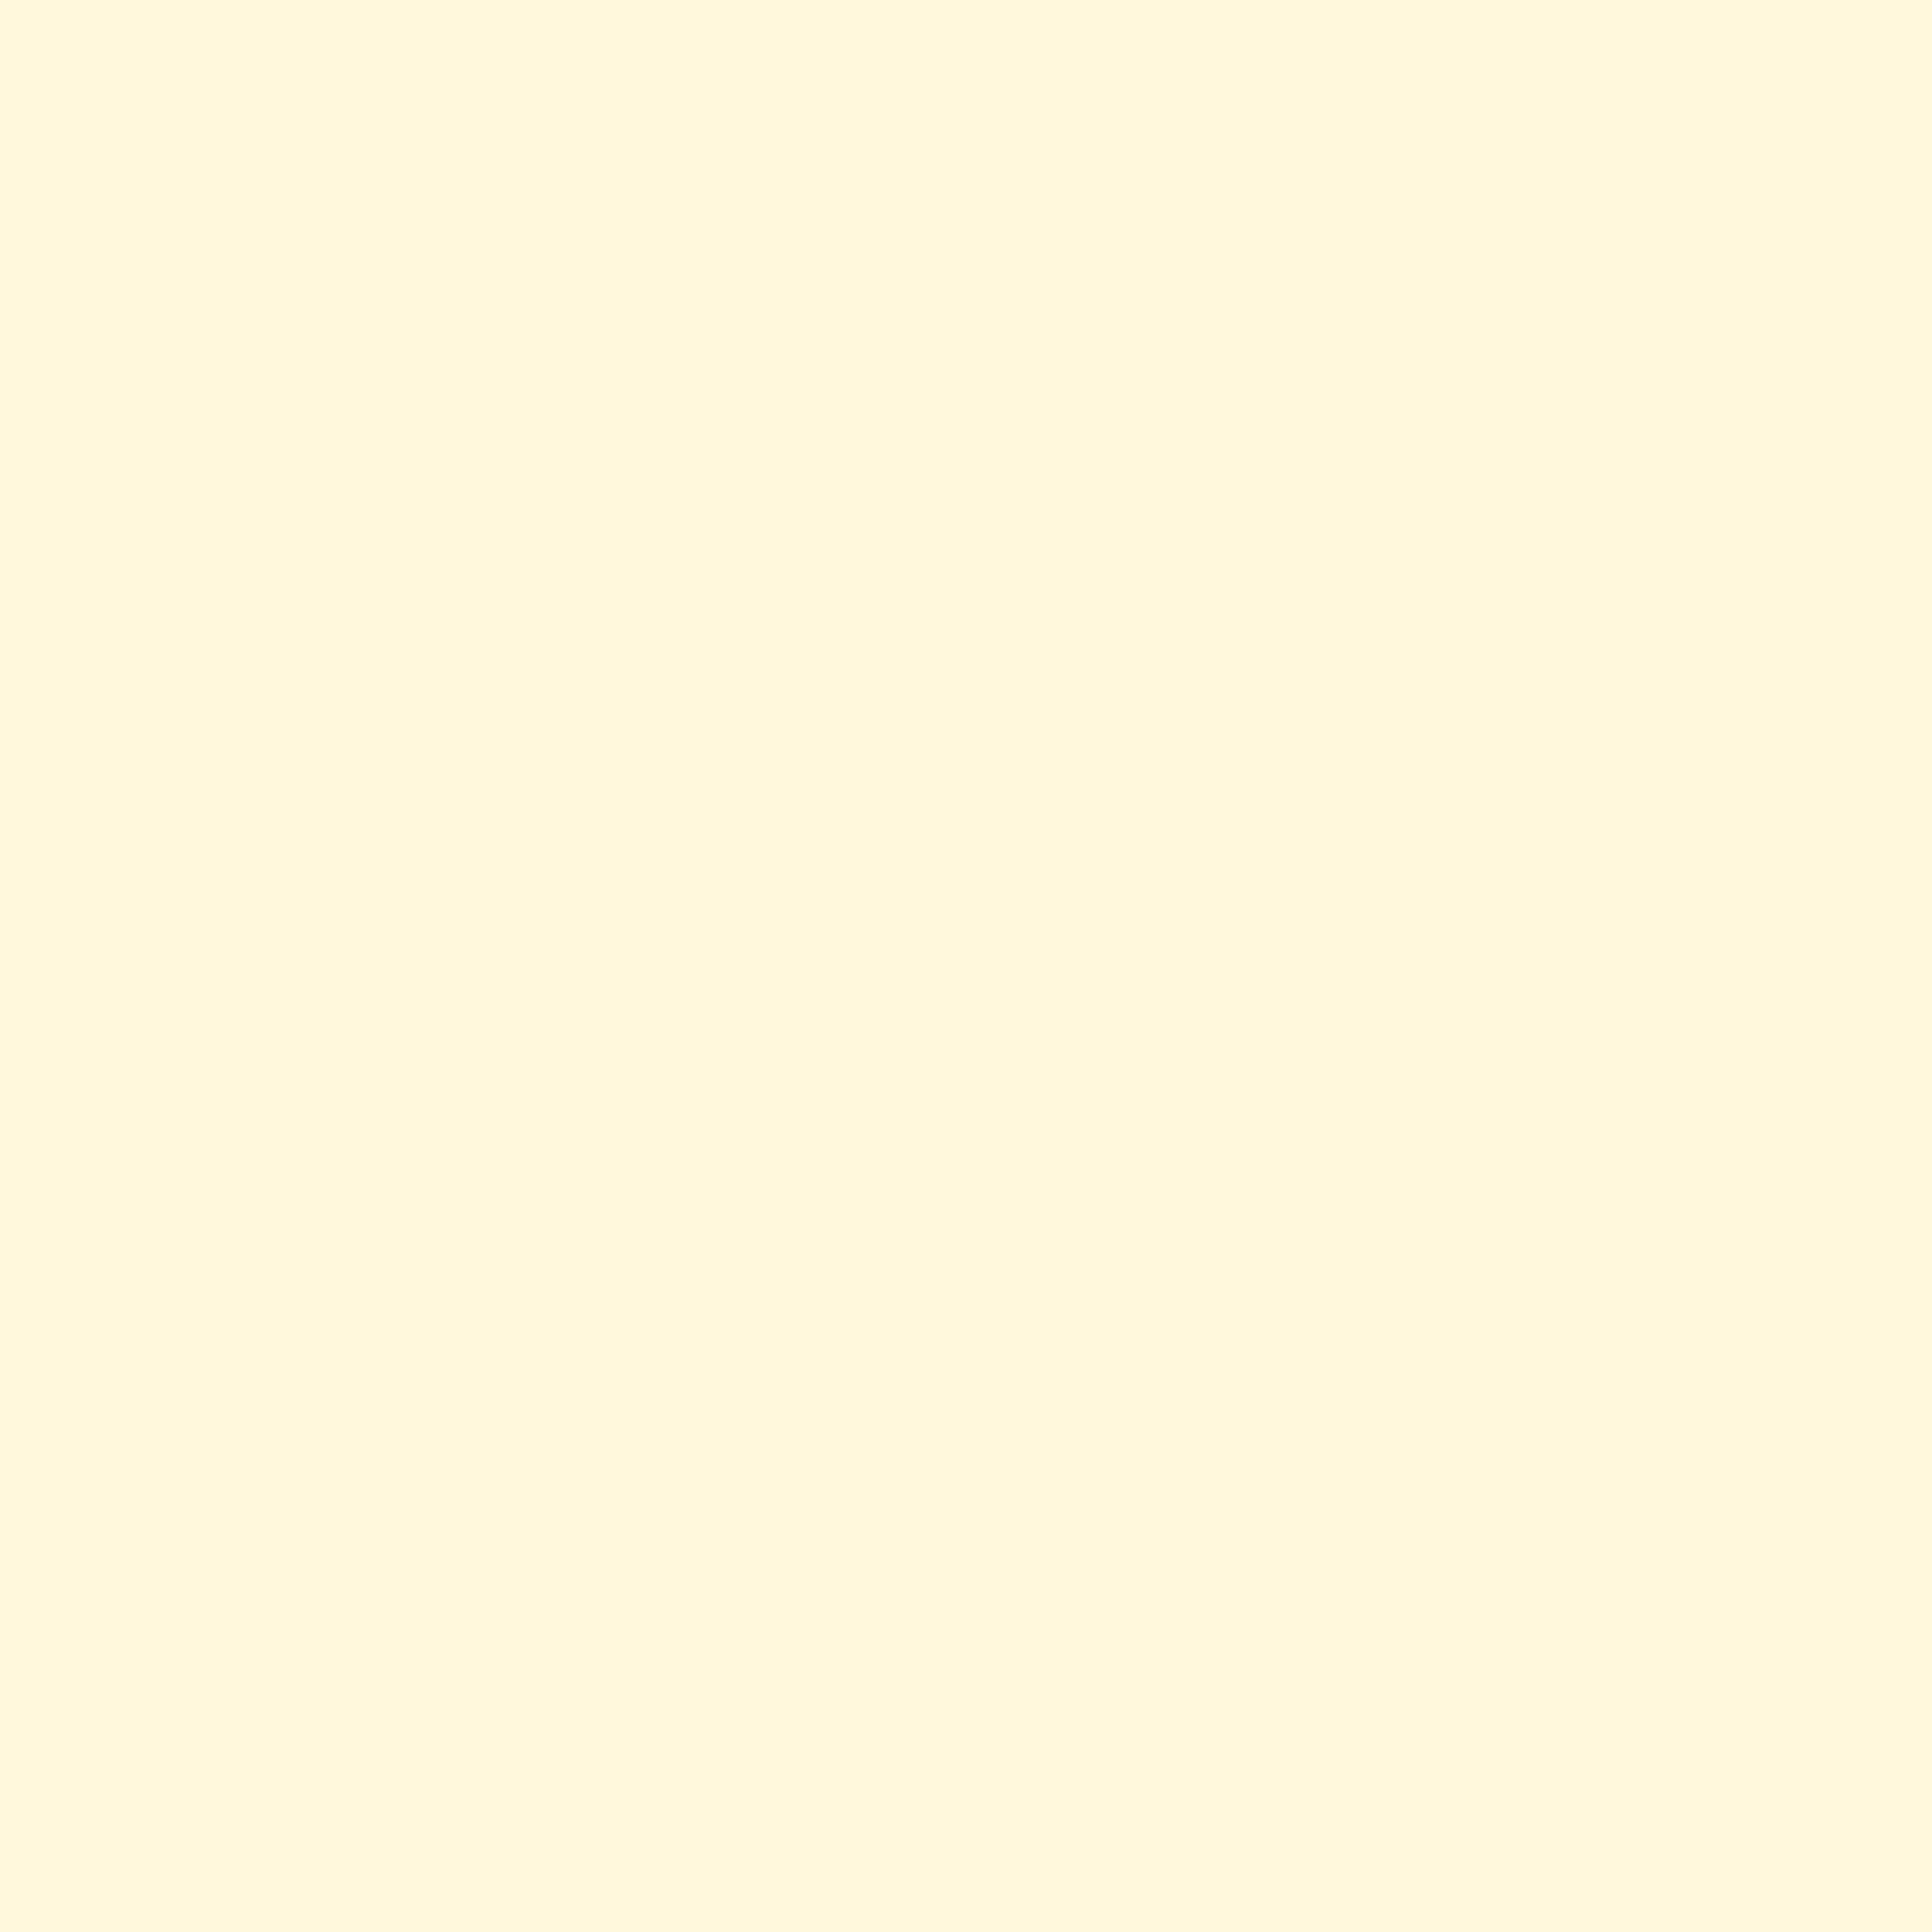 3600x3600 Cornsilk Solid Color Background